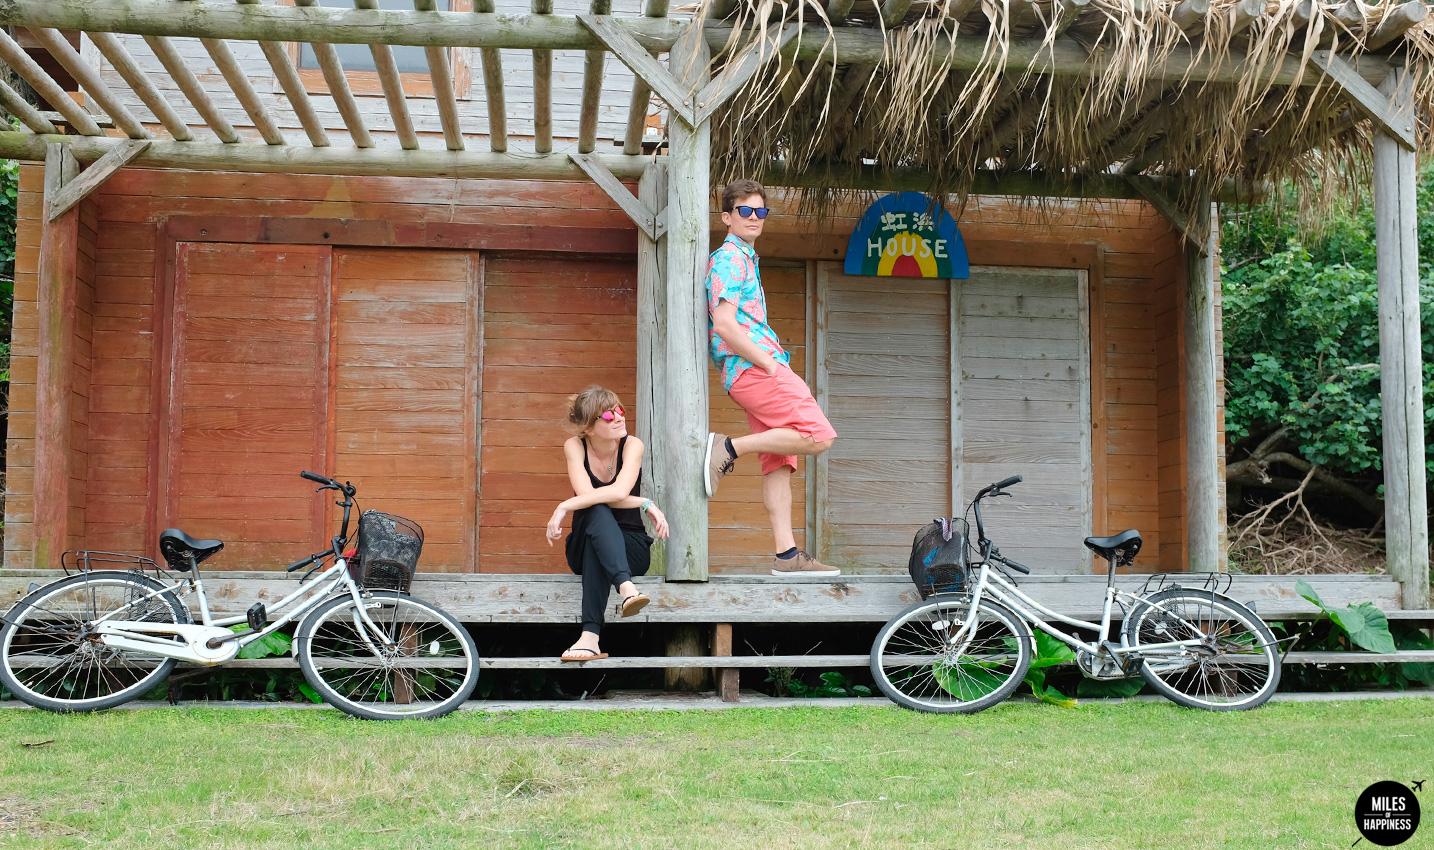 Island hopping in Okinawa: A Guide to the Kerama Islands